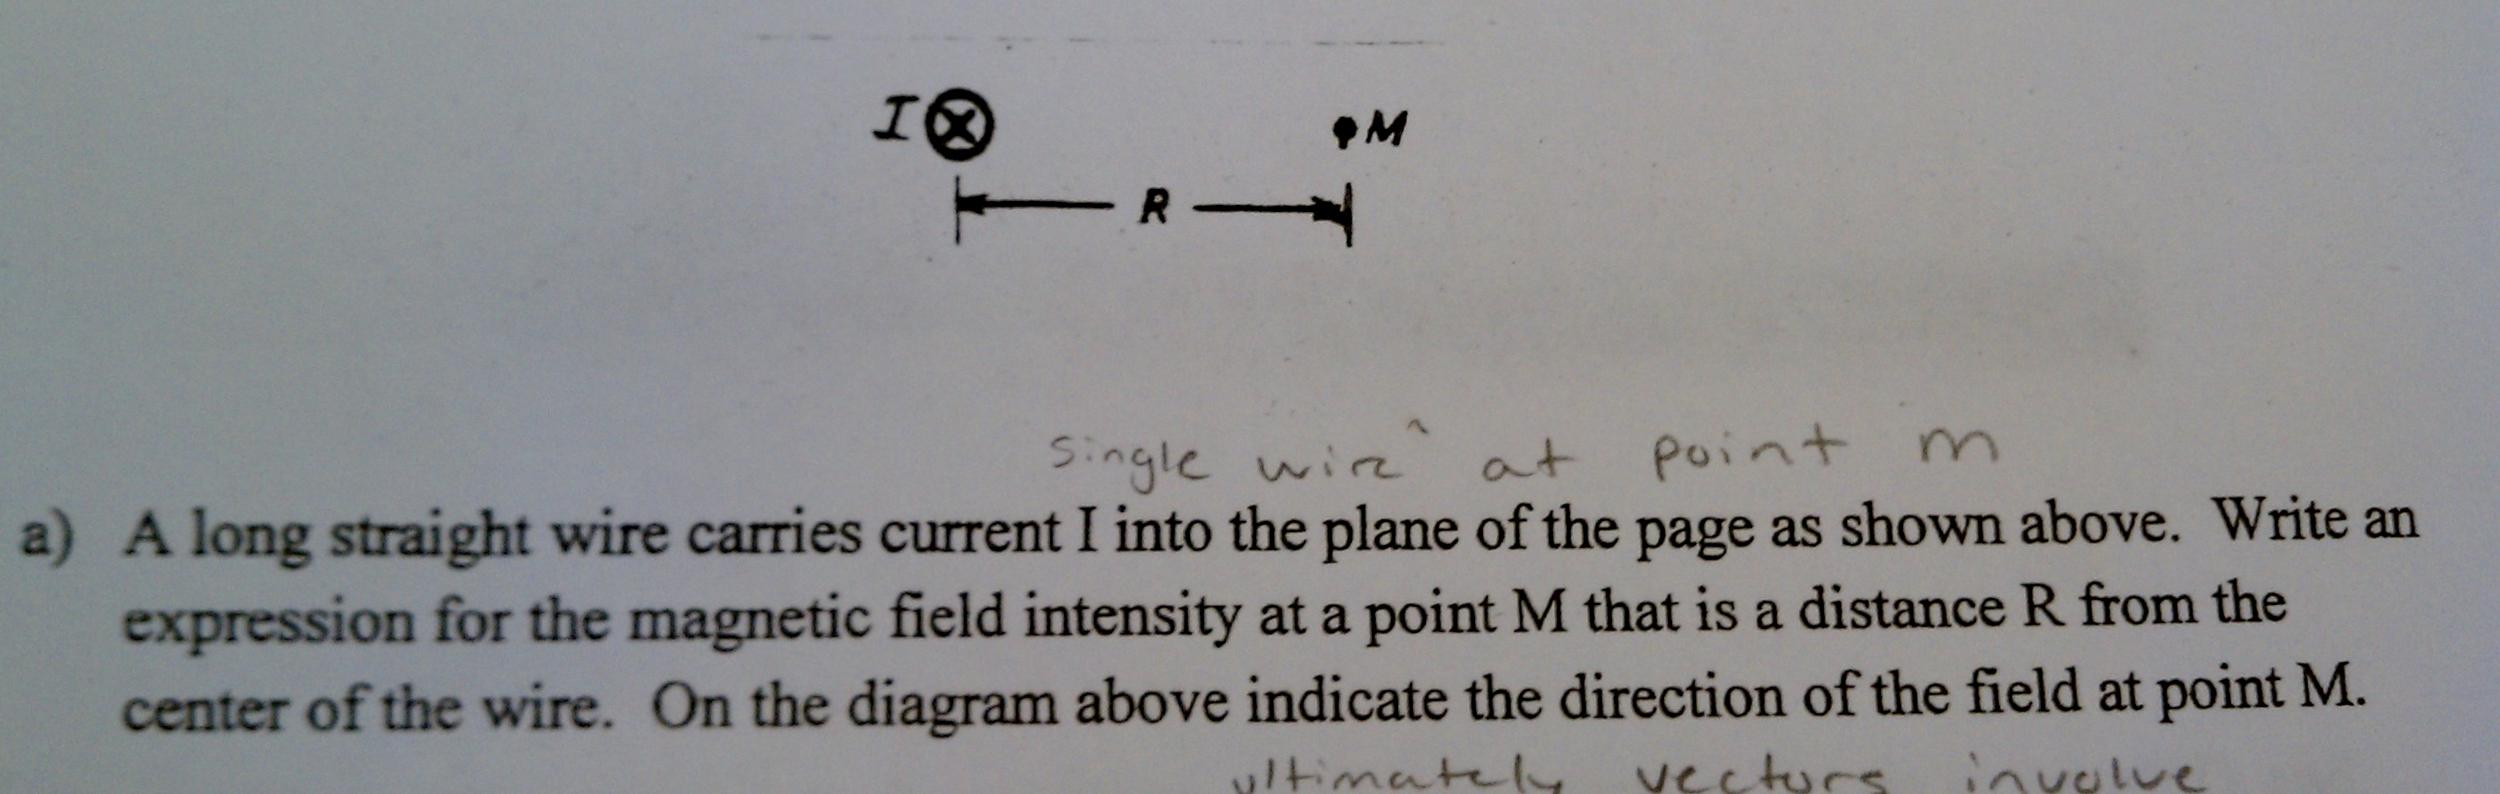 Advanced Physics Archive | November 22, 2012 | Chegg.com